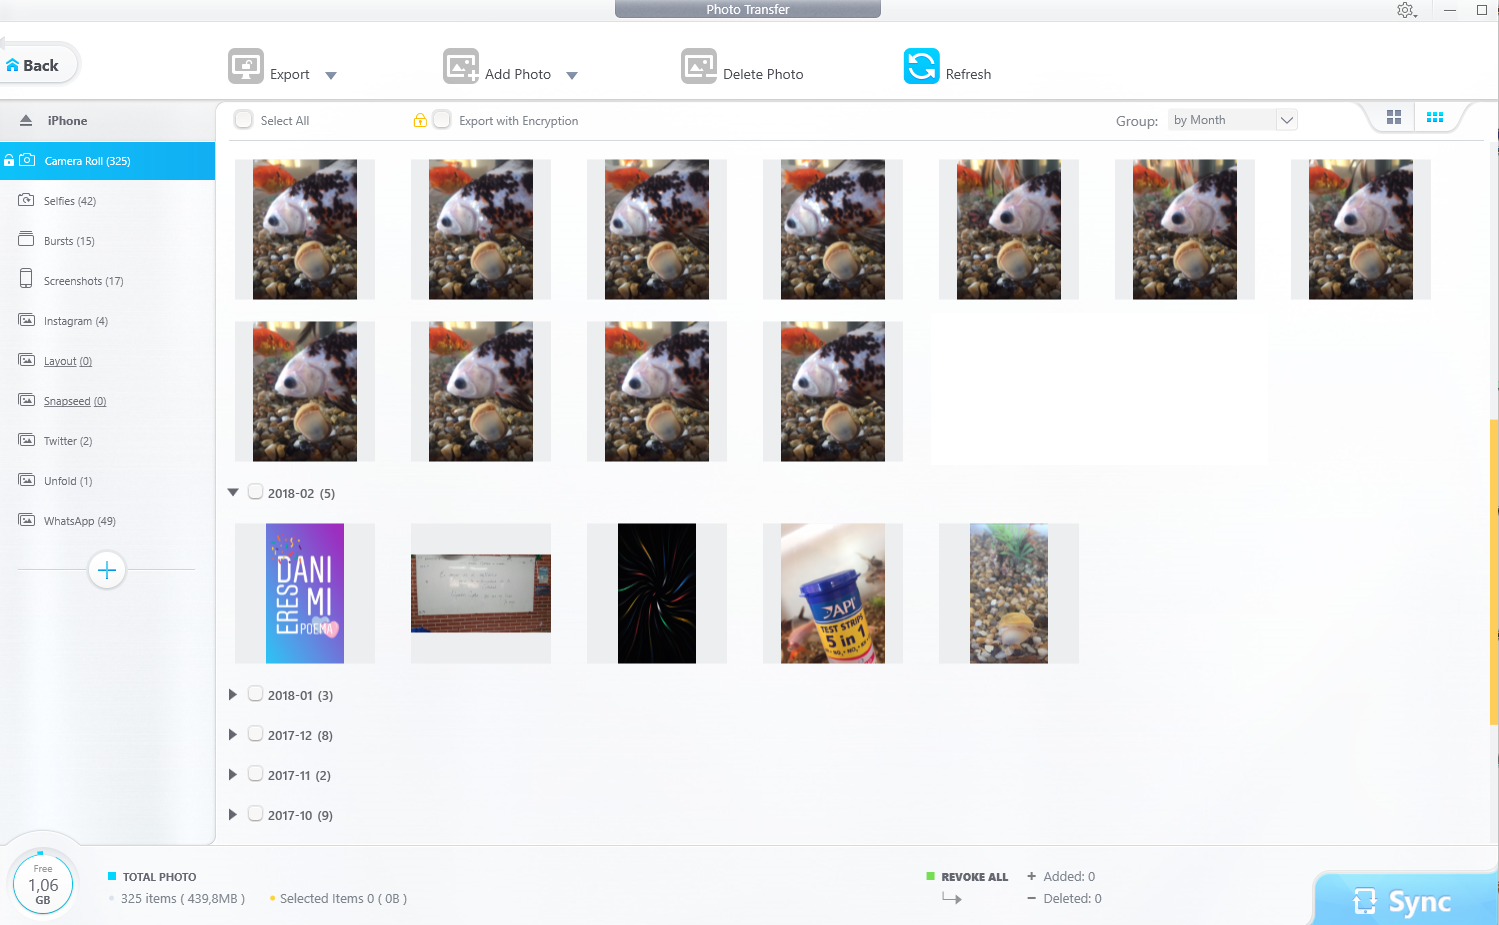 DearMob: Transfiere contenido de un iPhone antiguo al nuevo iPhone XS / XS MAX / XR